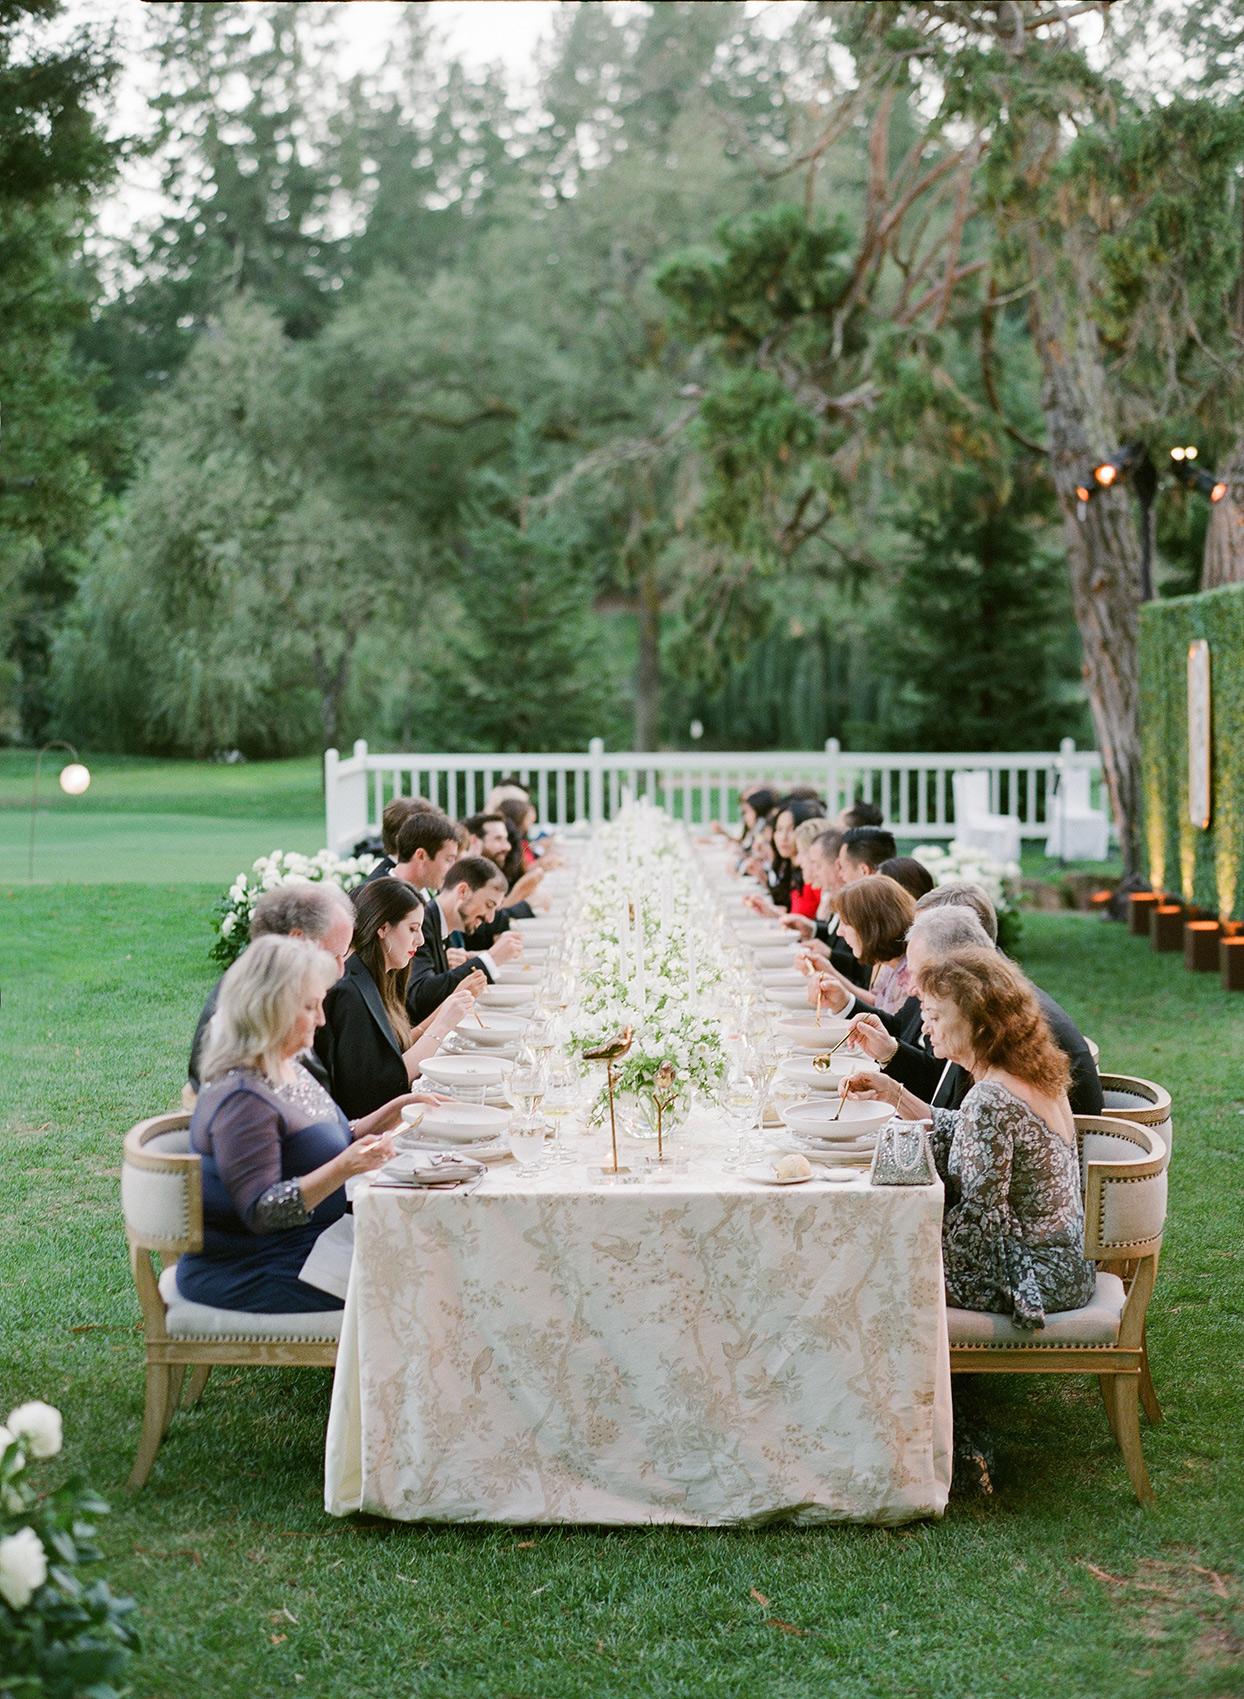 Wedding reception table with custom Ralph Lauren table runner